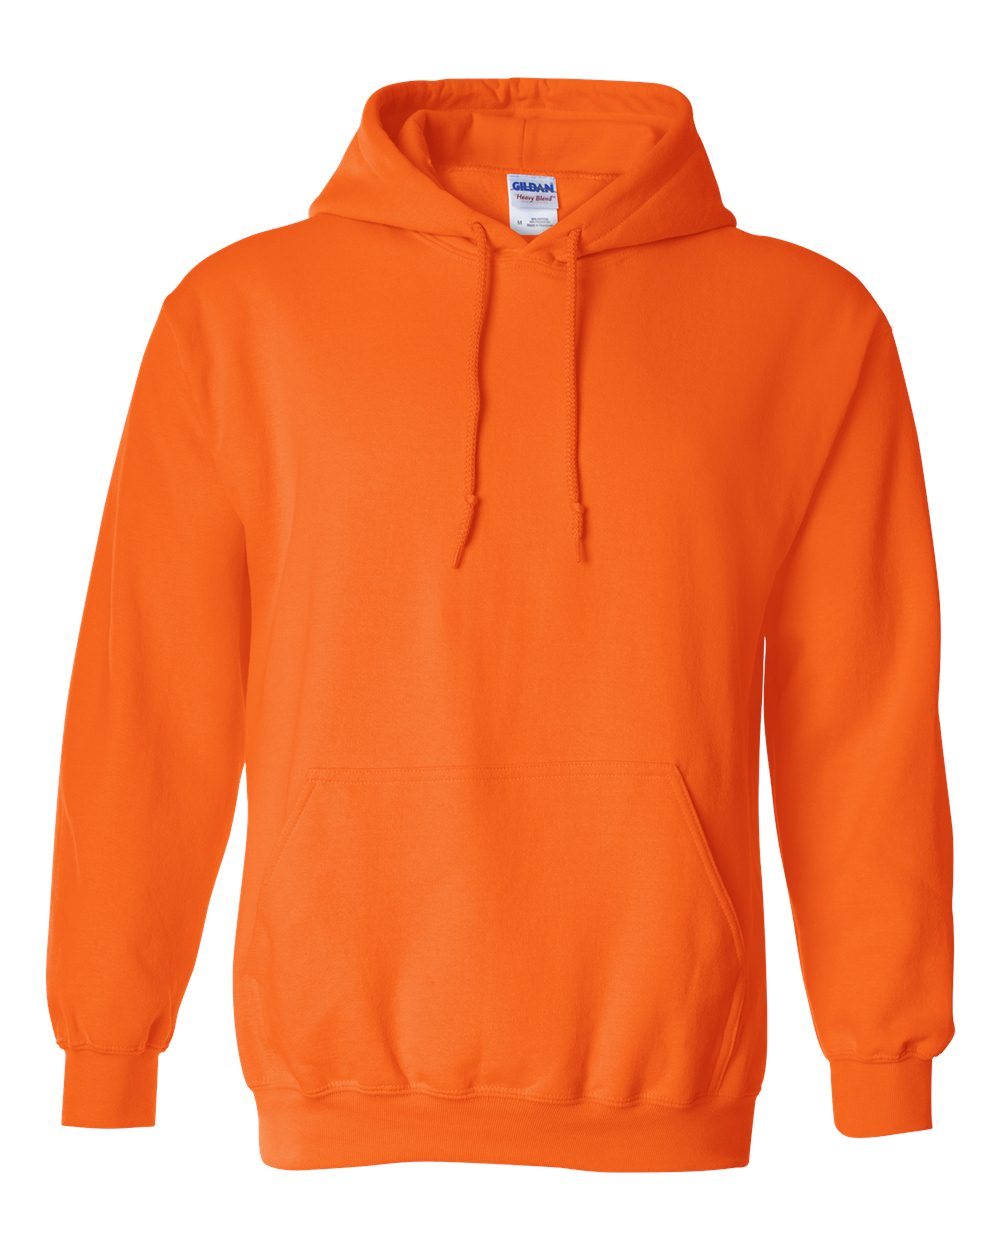 Gildan-Mens-Blank-Hoodie-Heavy-Blend-Hooded-Sweatshirt-Solid-18500-up-to-5XL thumbnail 83